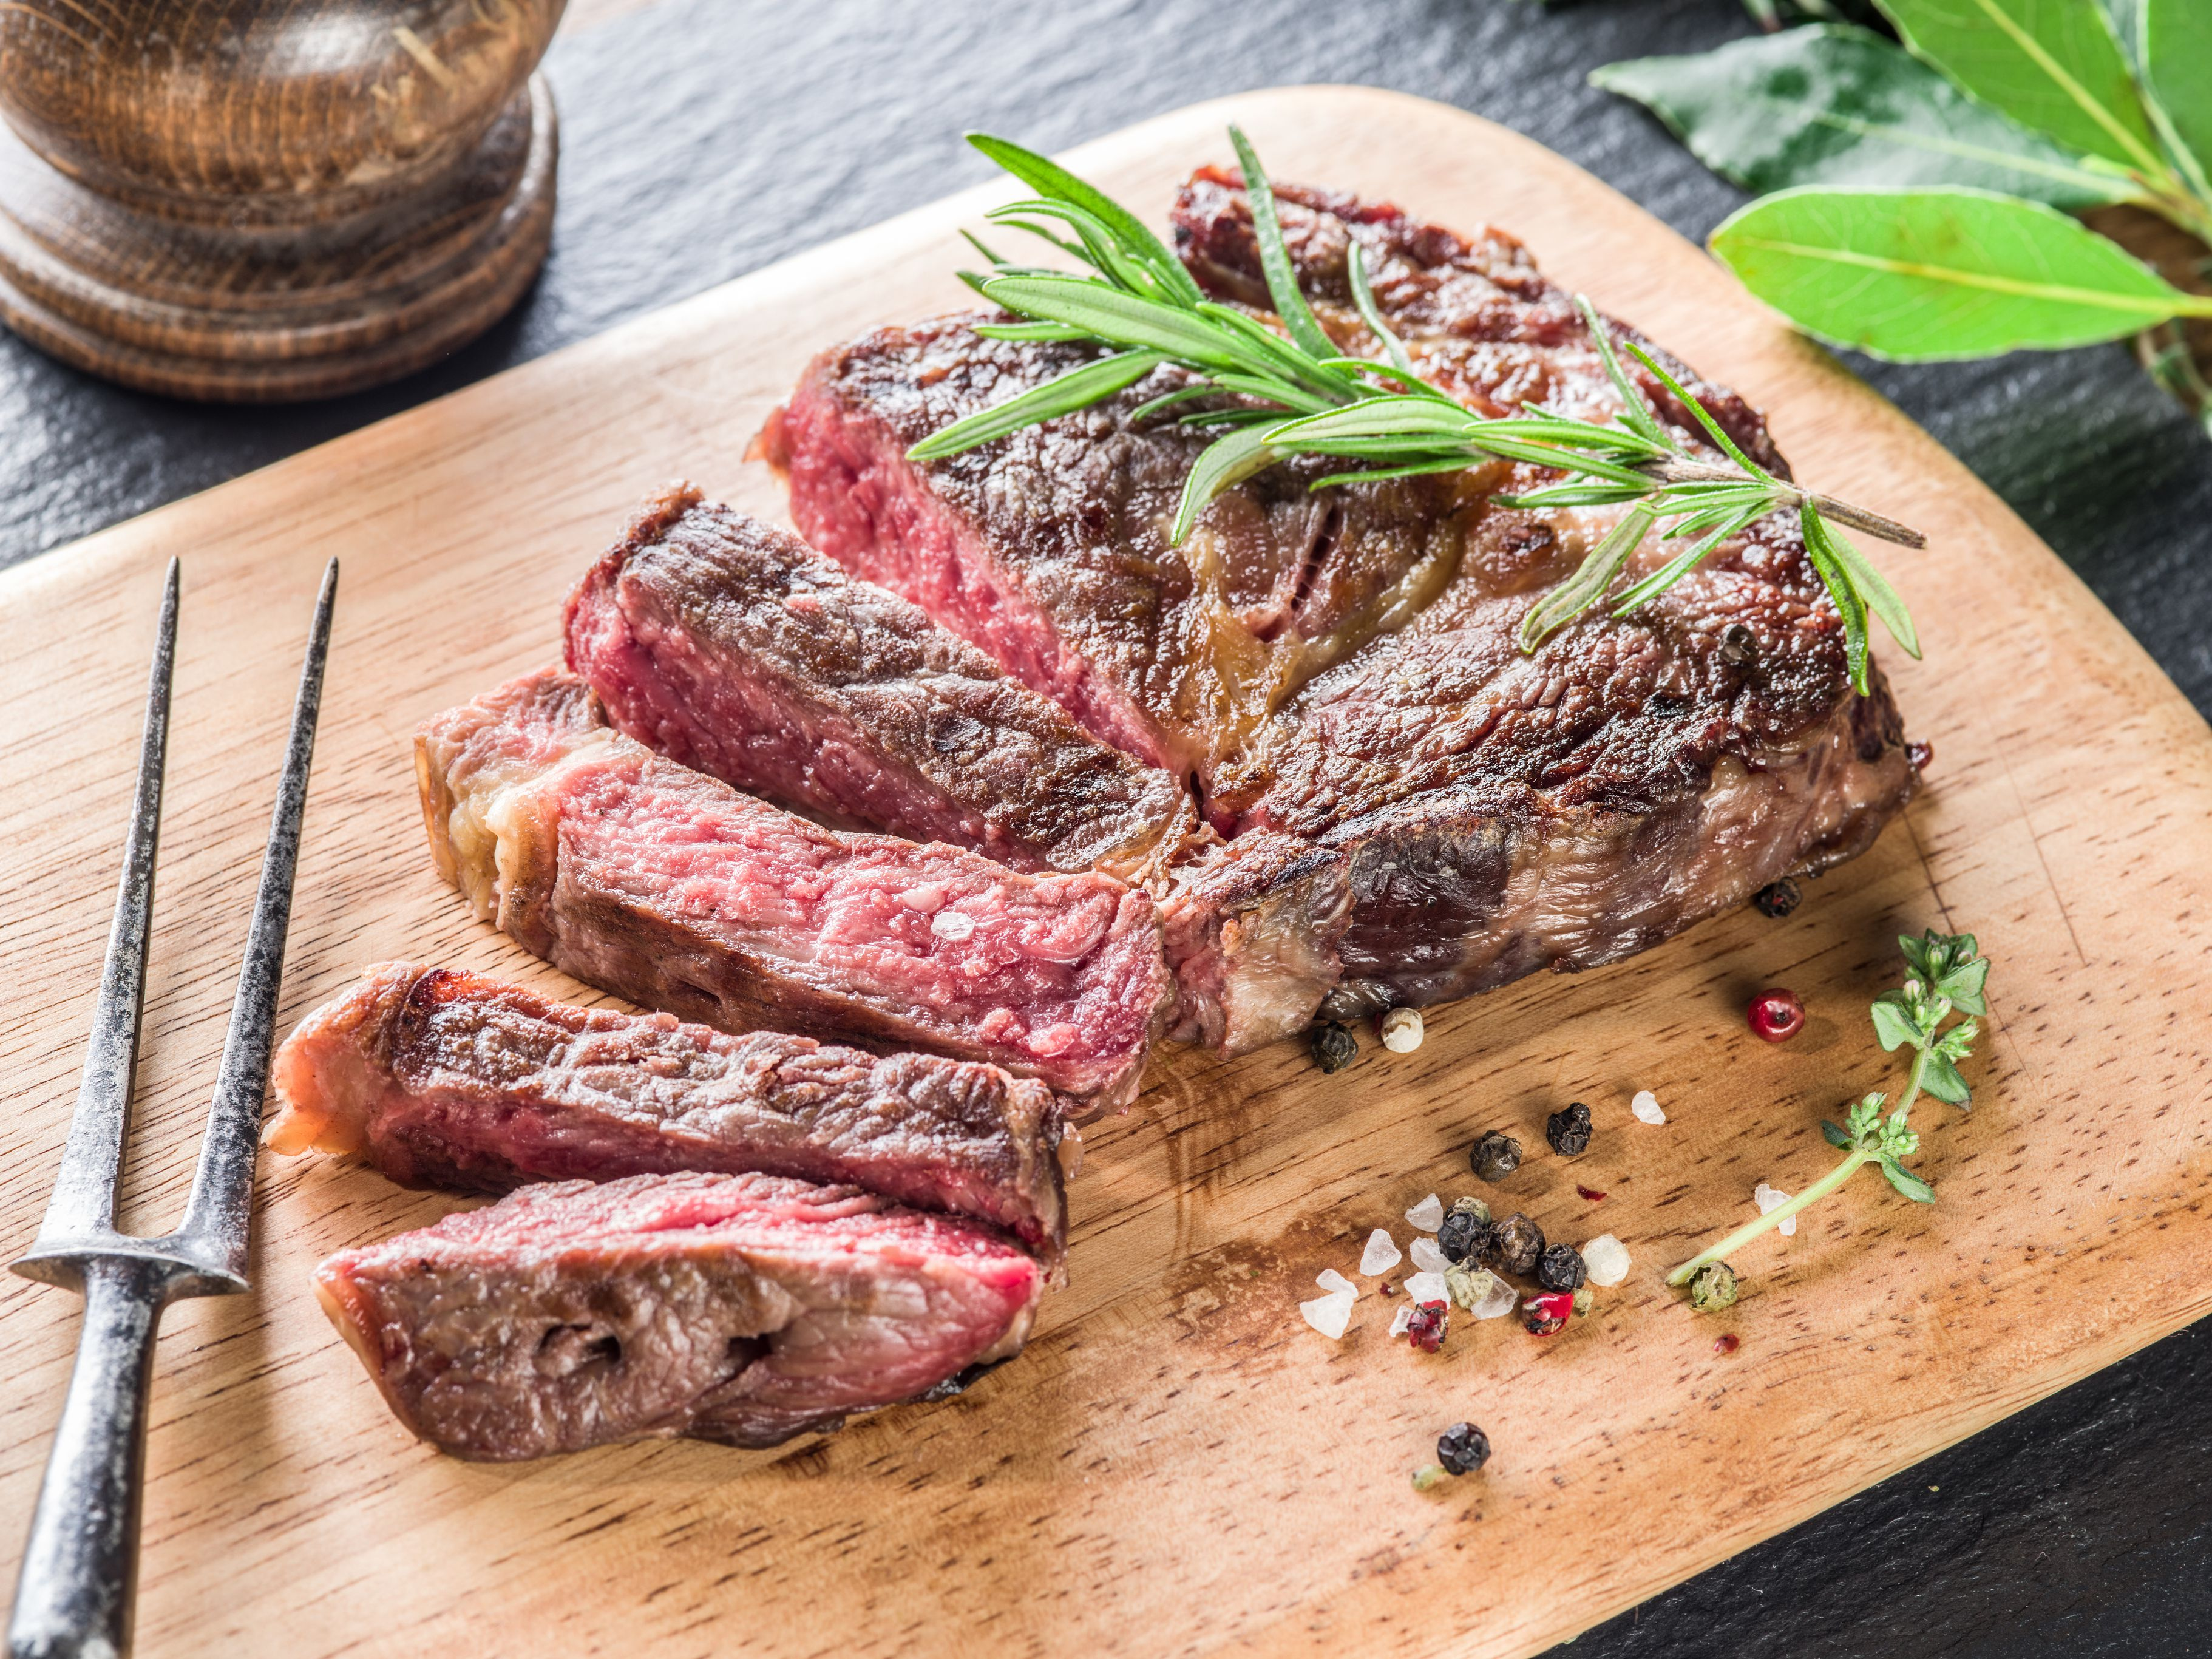 Medium Ribeye steak with spices.